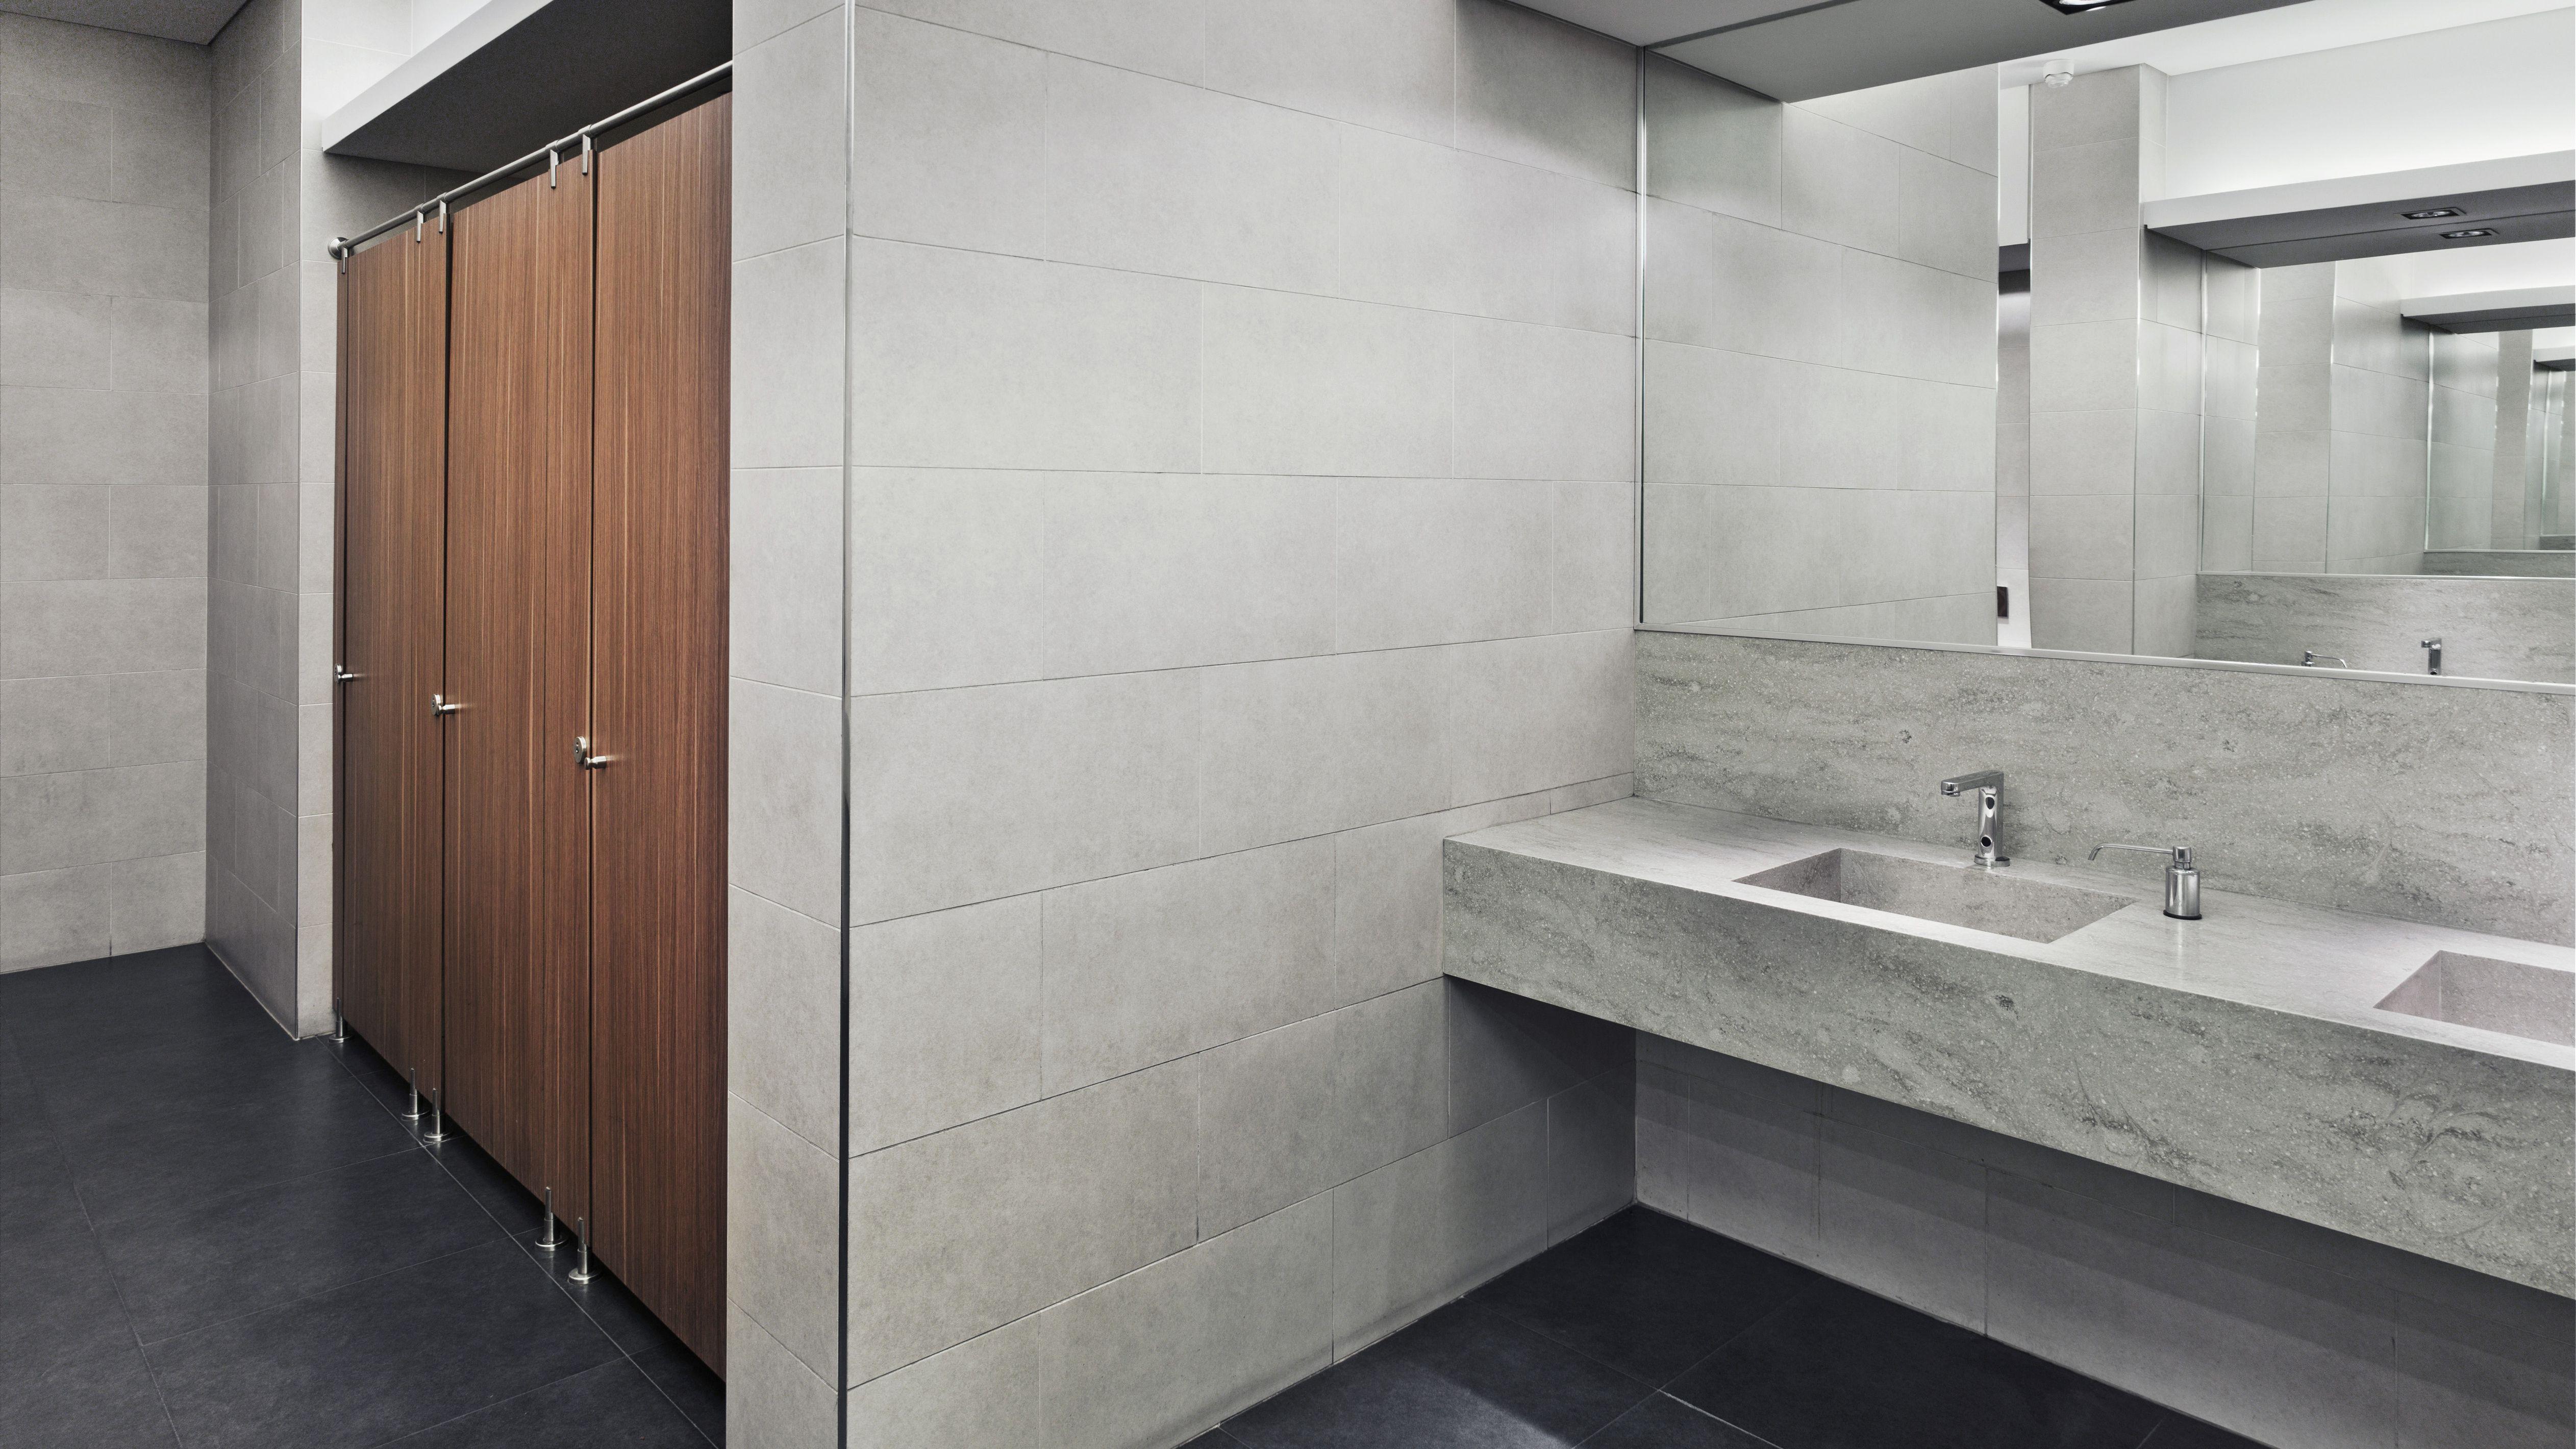 Best Options For Public Bathroom Floors